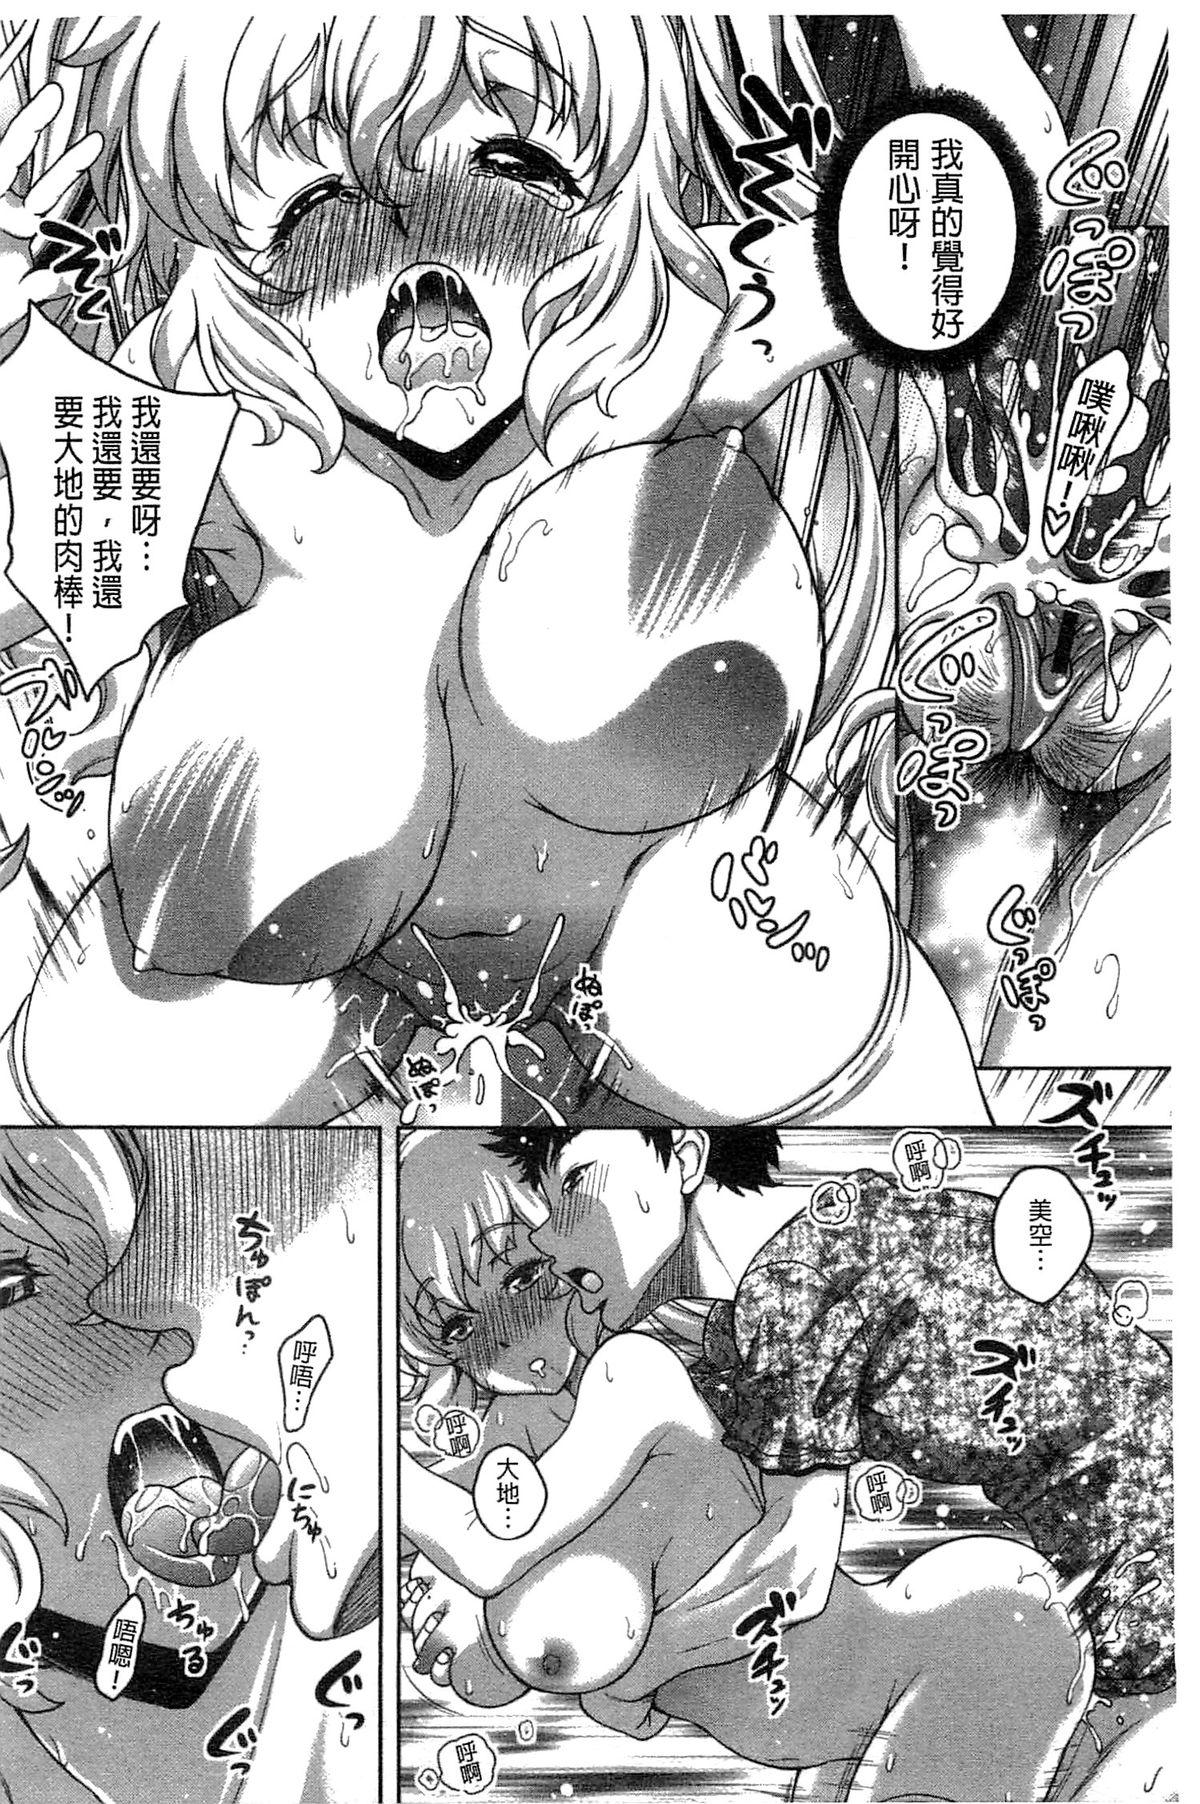 Hajimete nan da kara 162